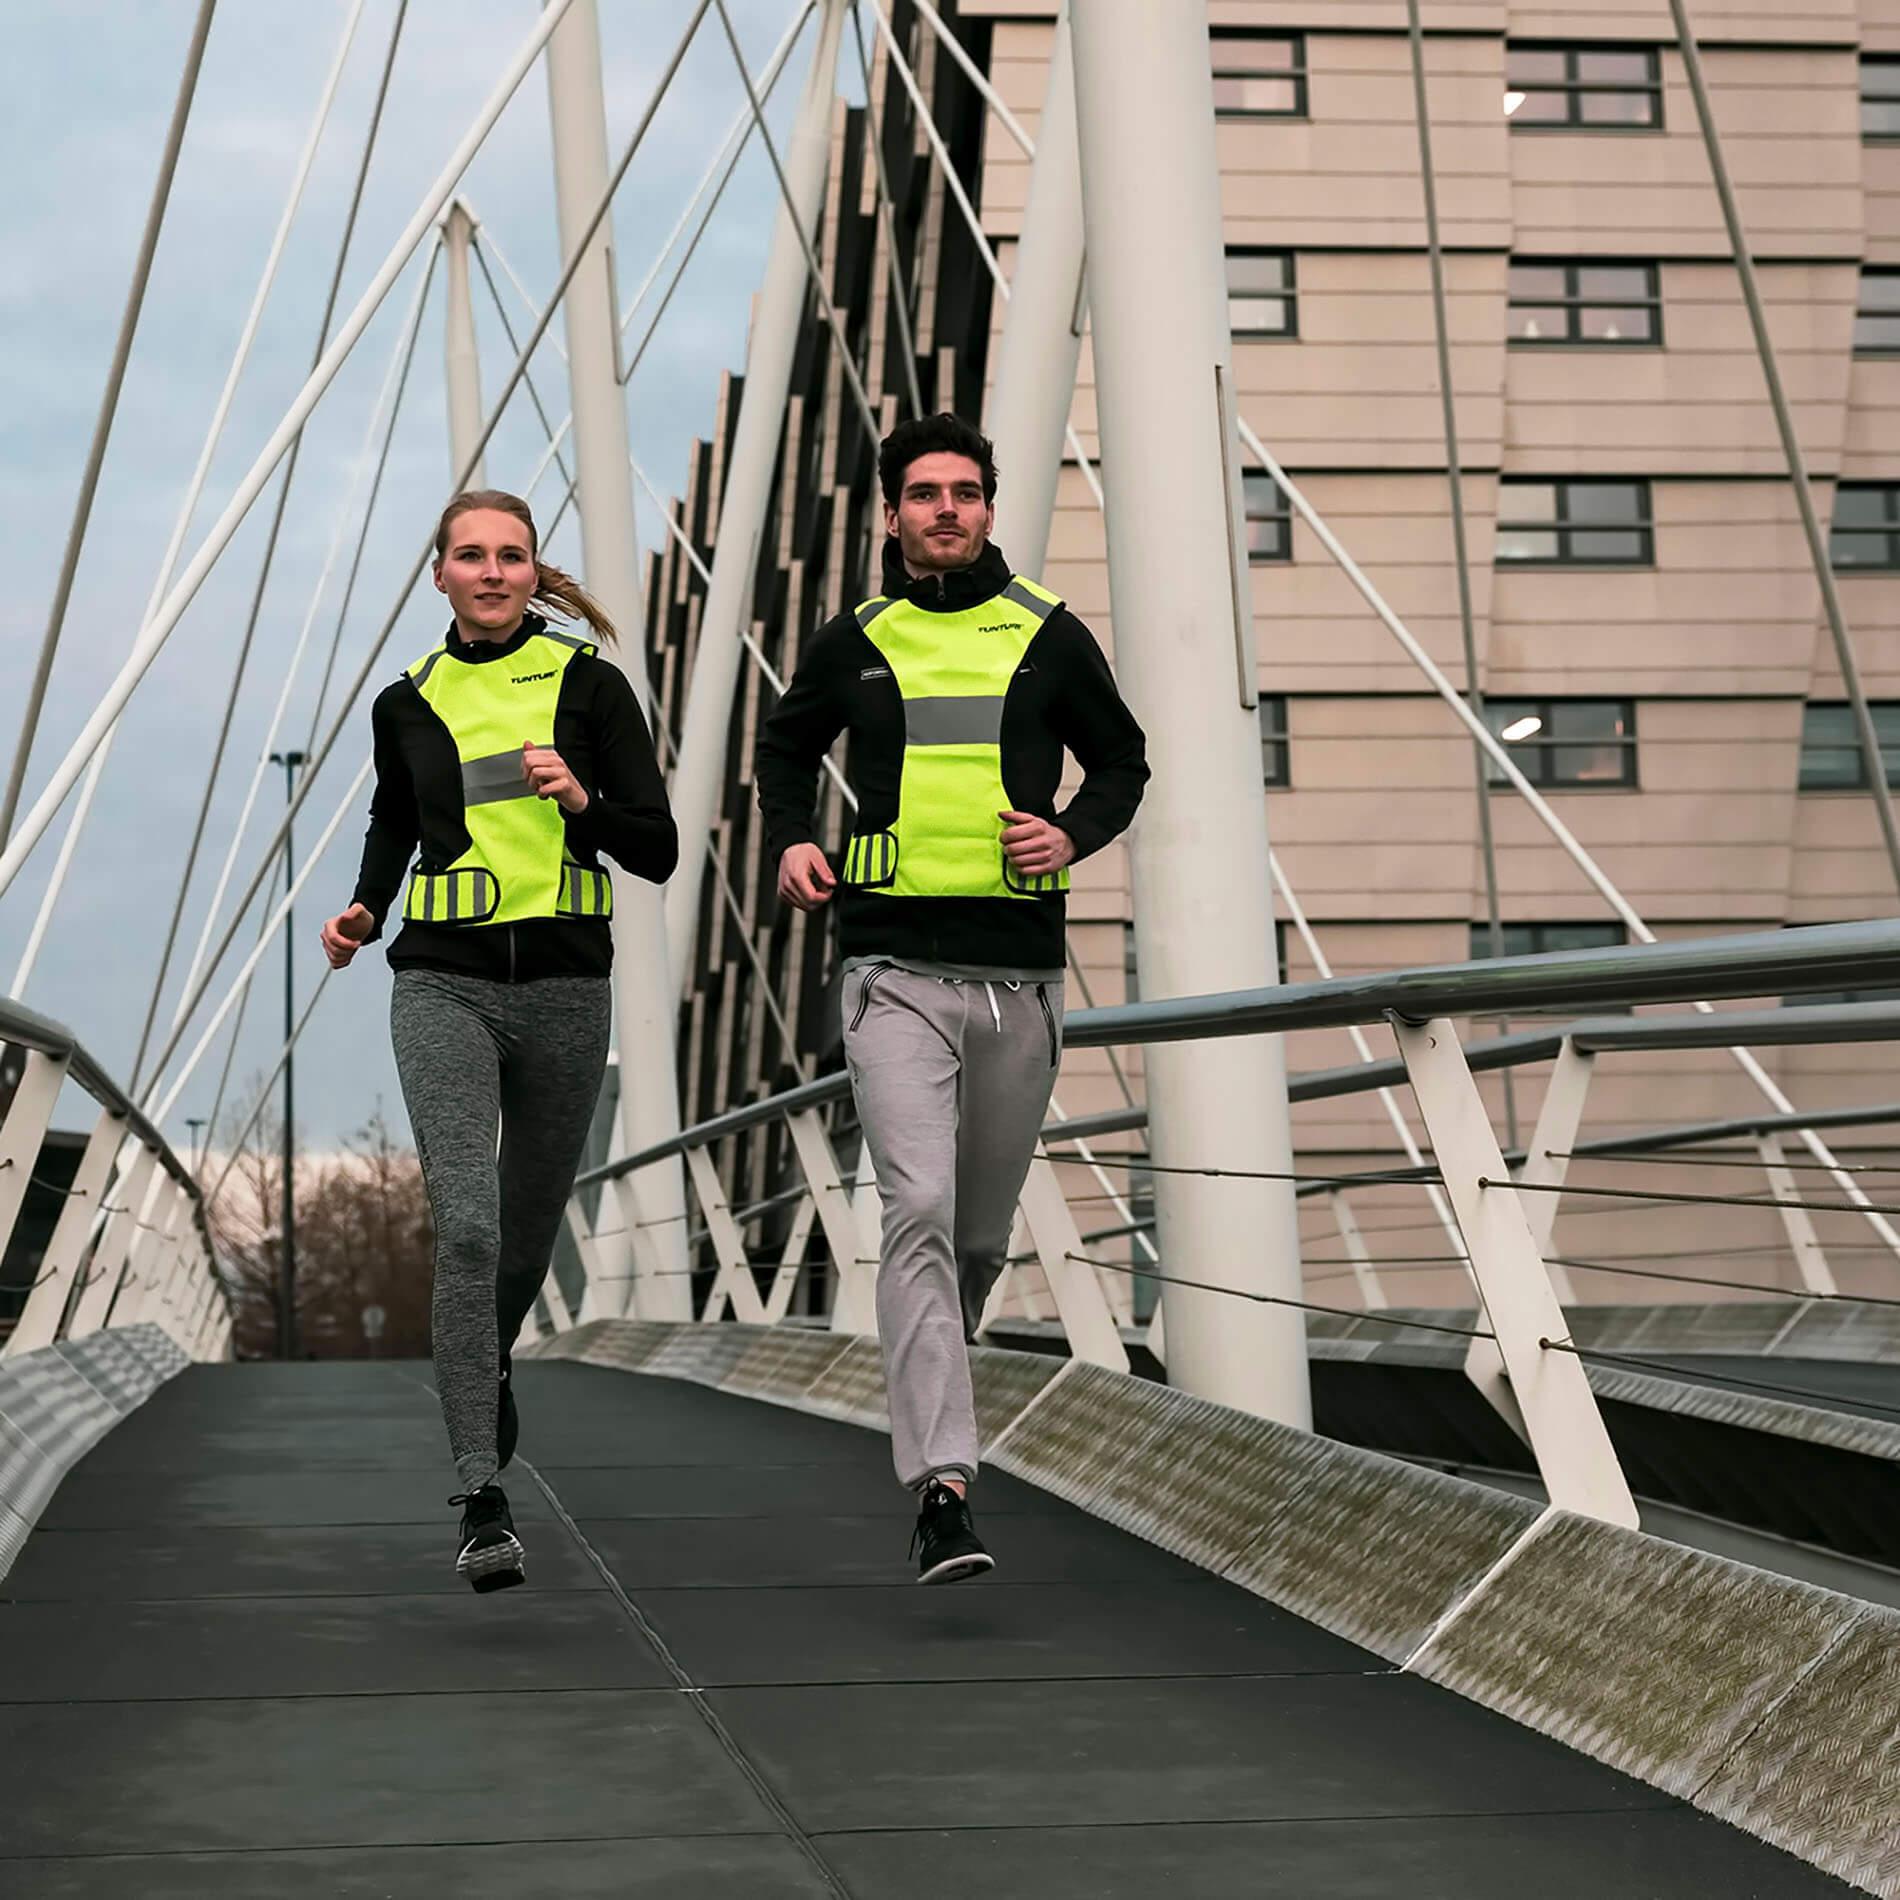 Running Vest - X-vorm hardloopvest - Reflecterend